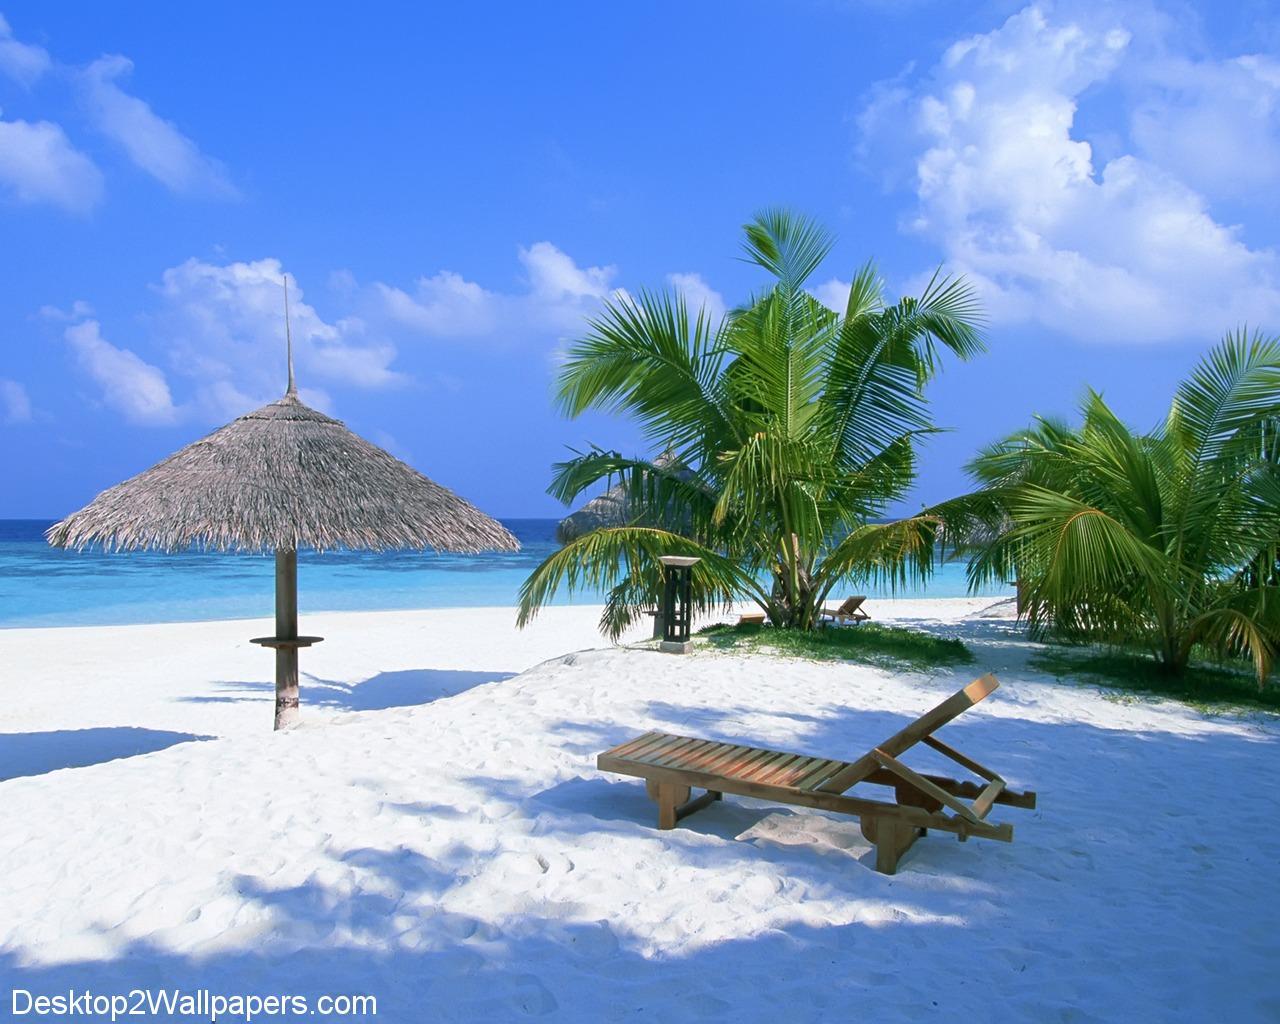 Paradise Wallpaper Desktop 10900 Hd Wallpapers in Beach   Imagescicom 1280x1024